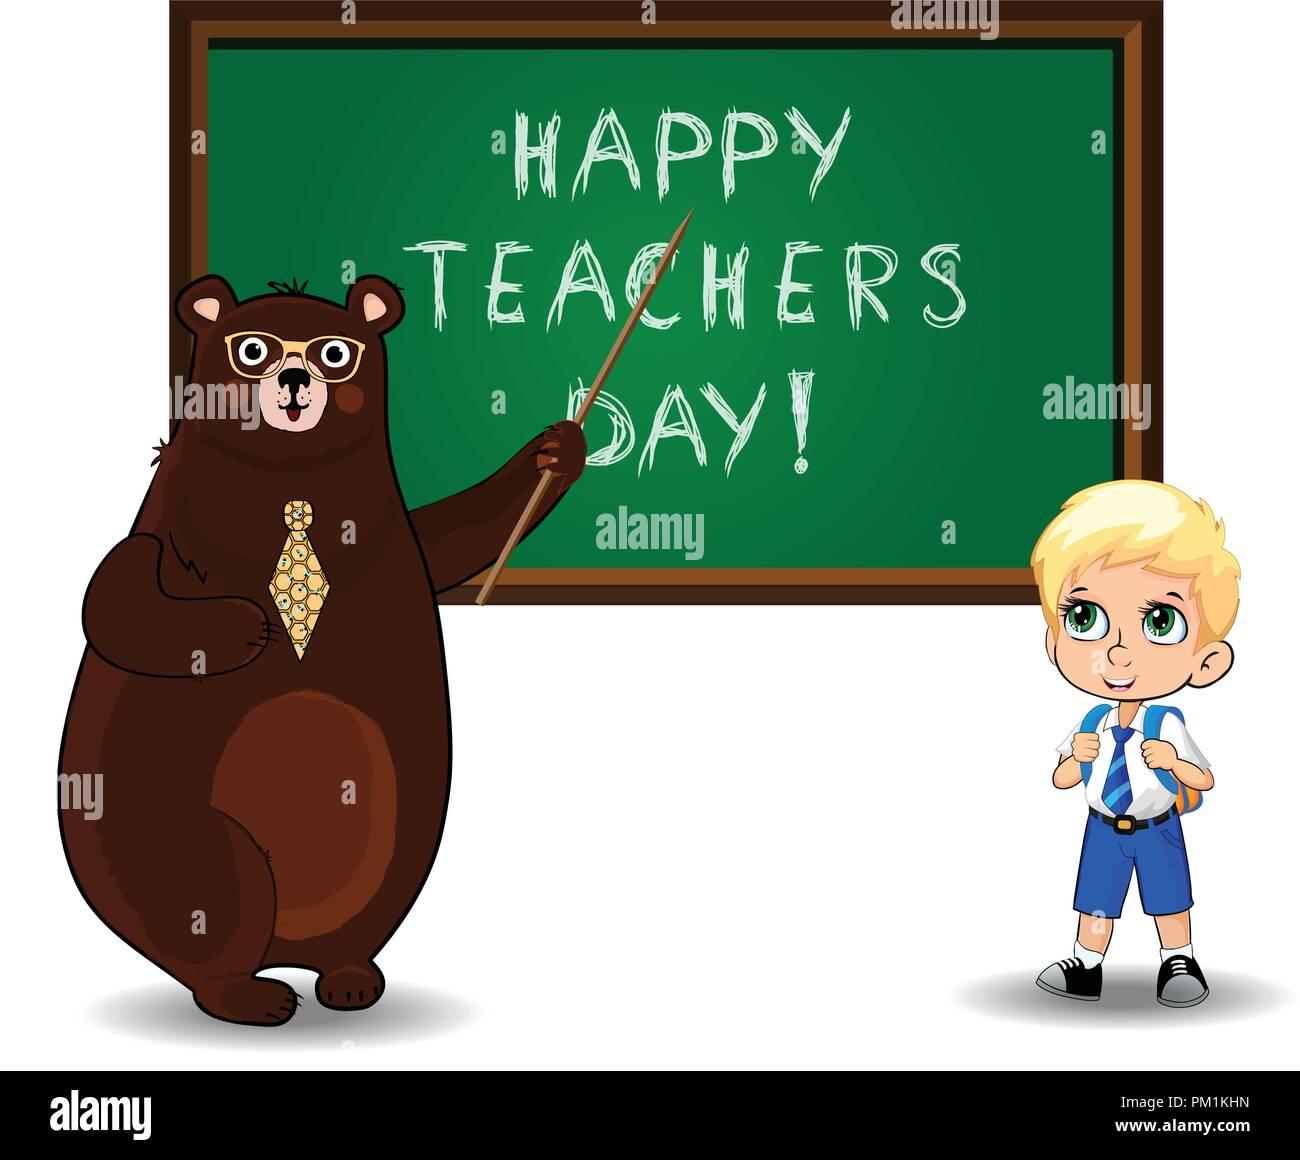 Happy teachers day stock photos happy teachers day stock images happy teachers day greeting card clip art with cute cartoon bear teacher wearing glasses and tie m4hsunfo